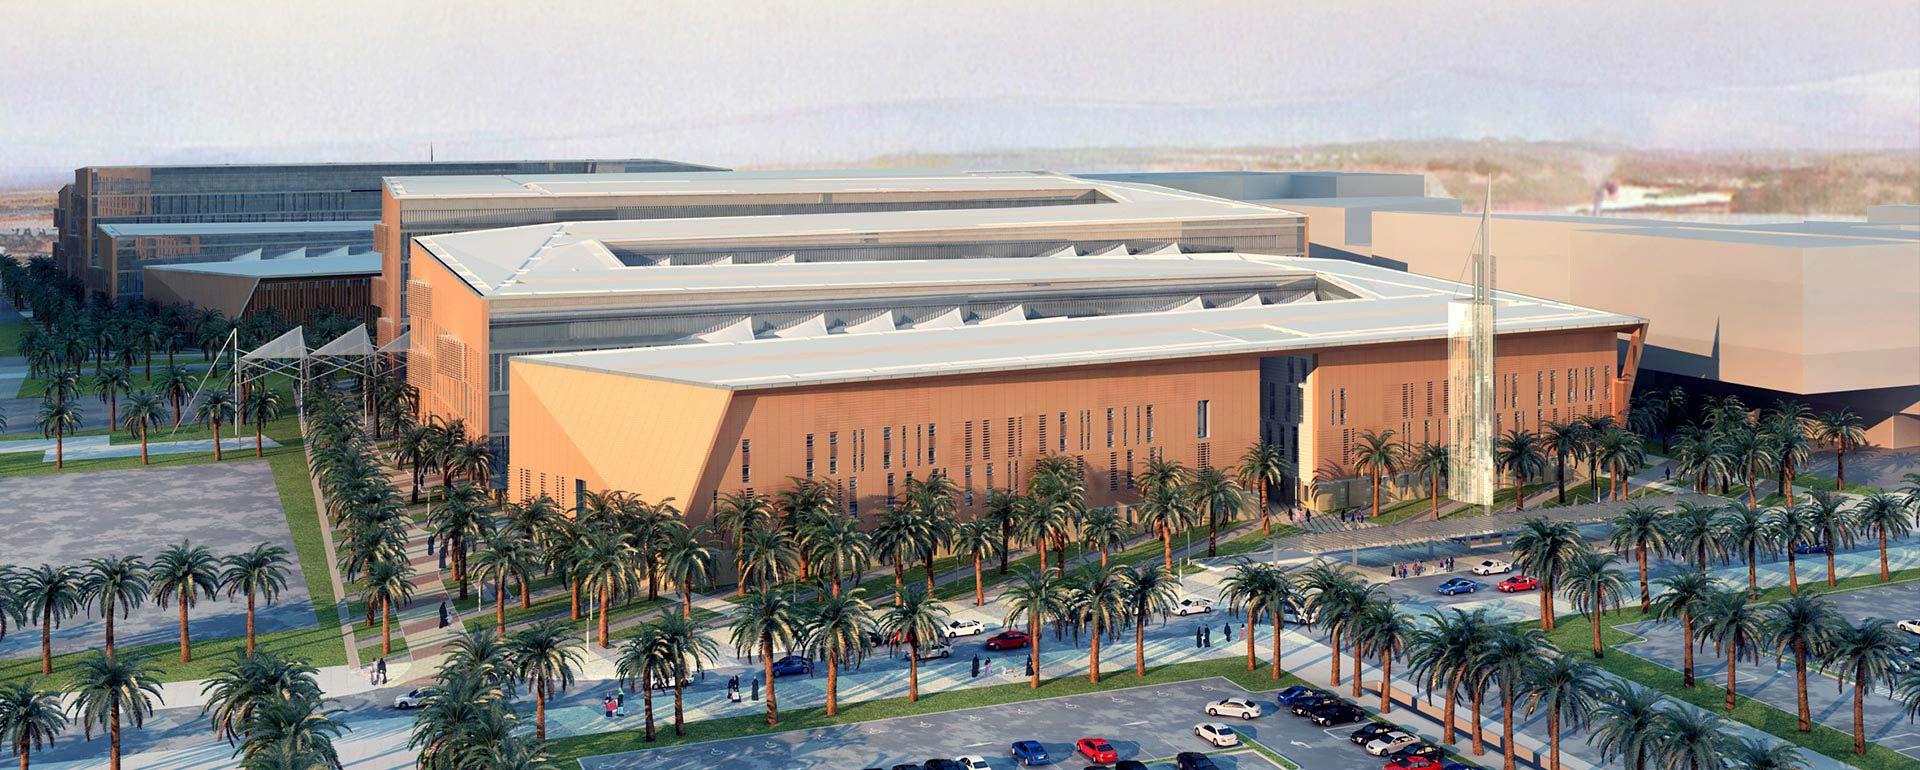 Engineering & Petroleum College Project - Sabah al-Salem University Campus1